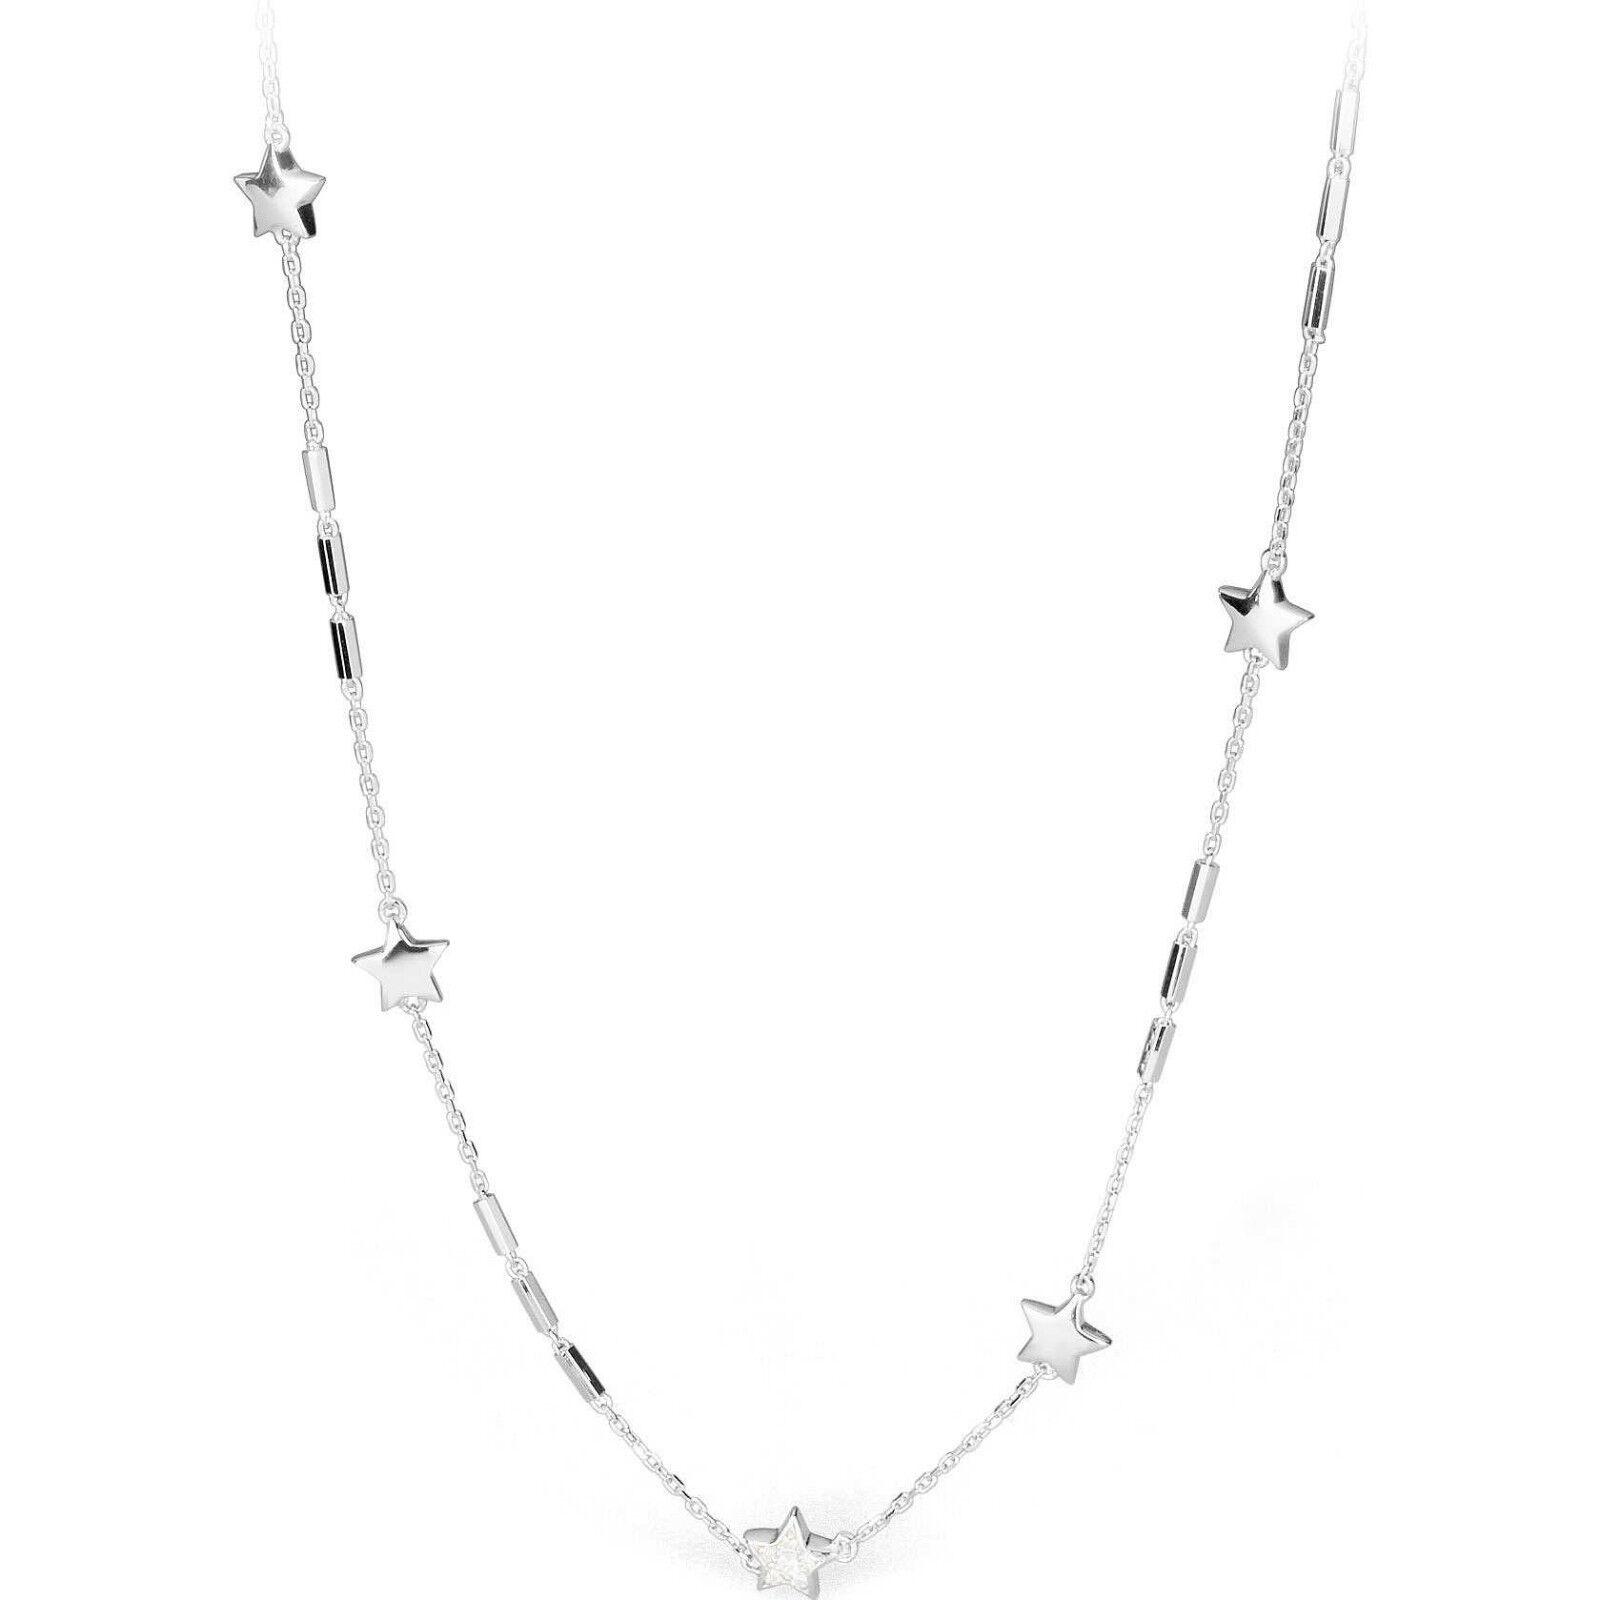 Collana Brosway argentoo argentoo argentoo Collezione Etoile Donna G9ET03 16770a